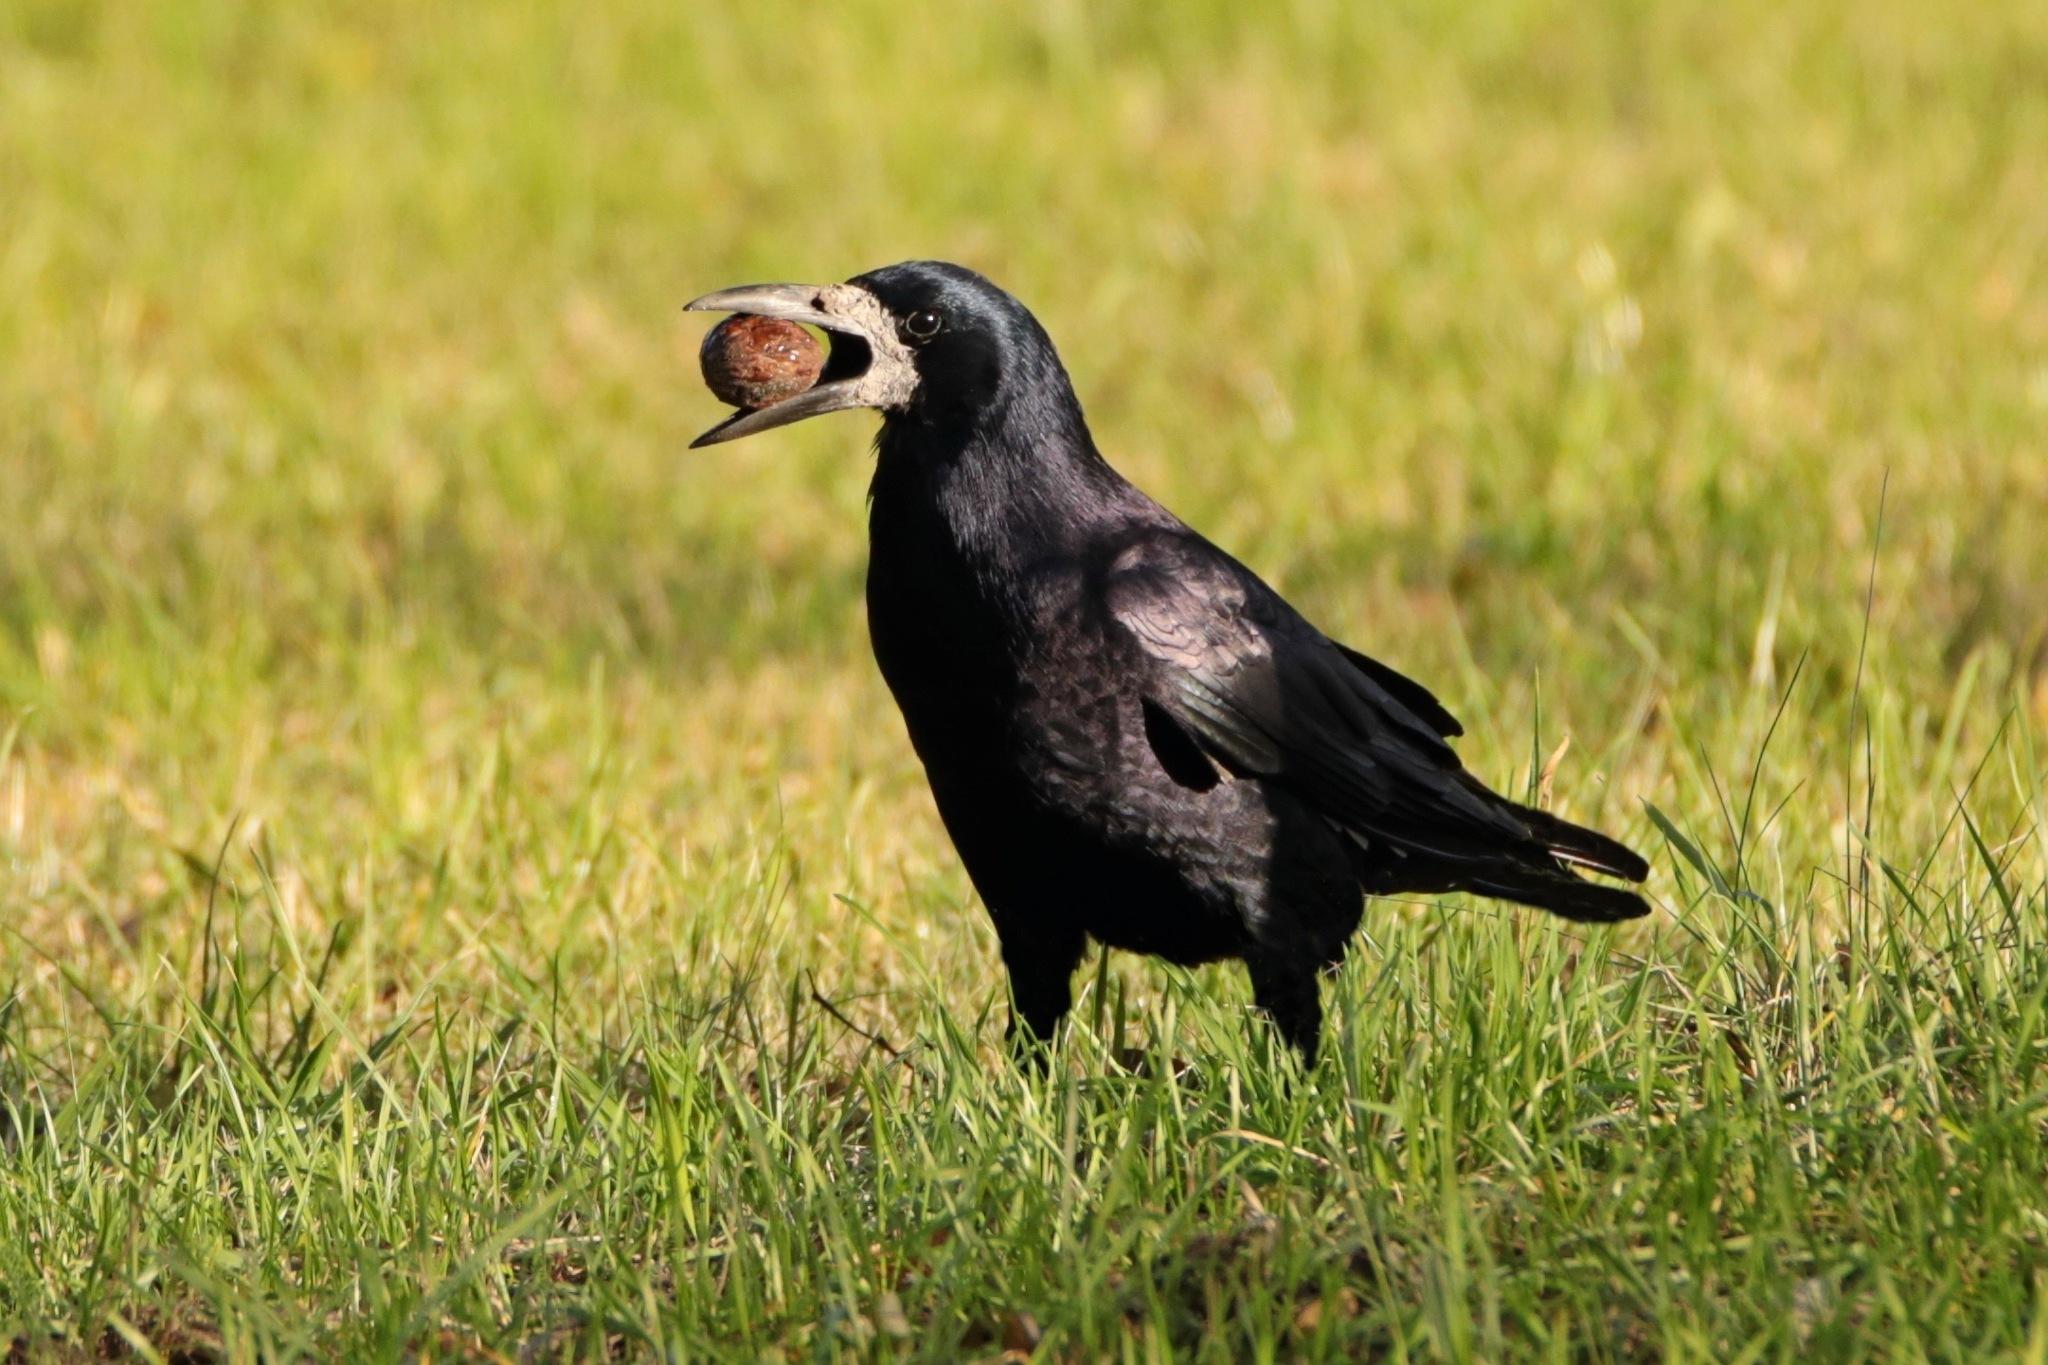 Rook (Corvus frugilegus) by Katarzyna Pyka